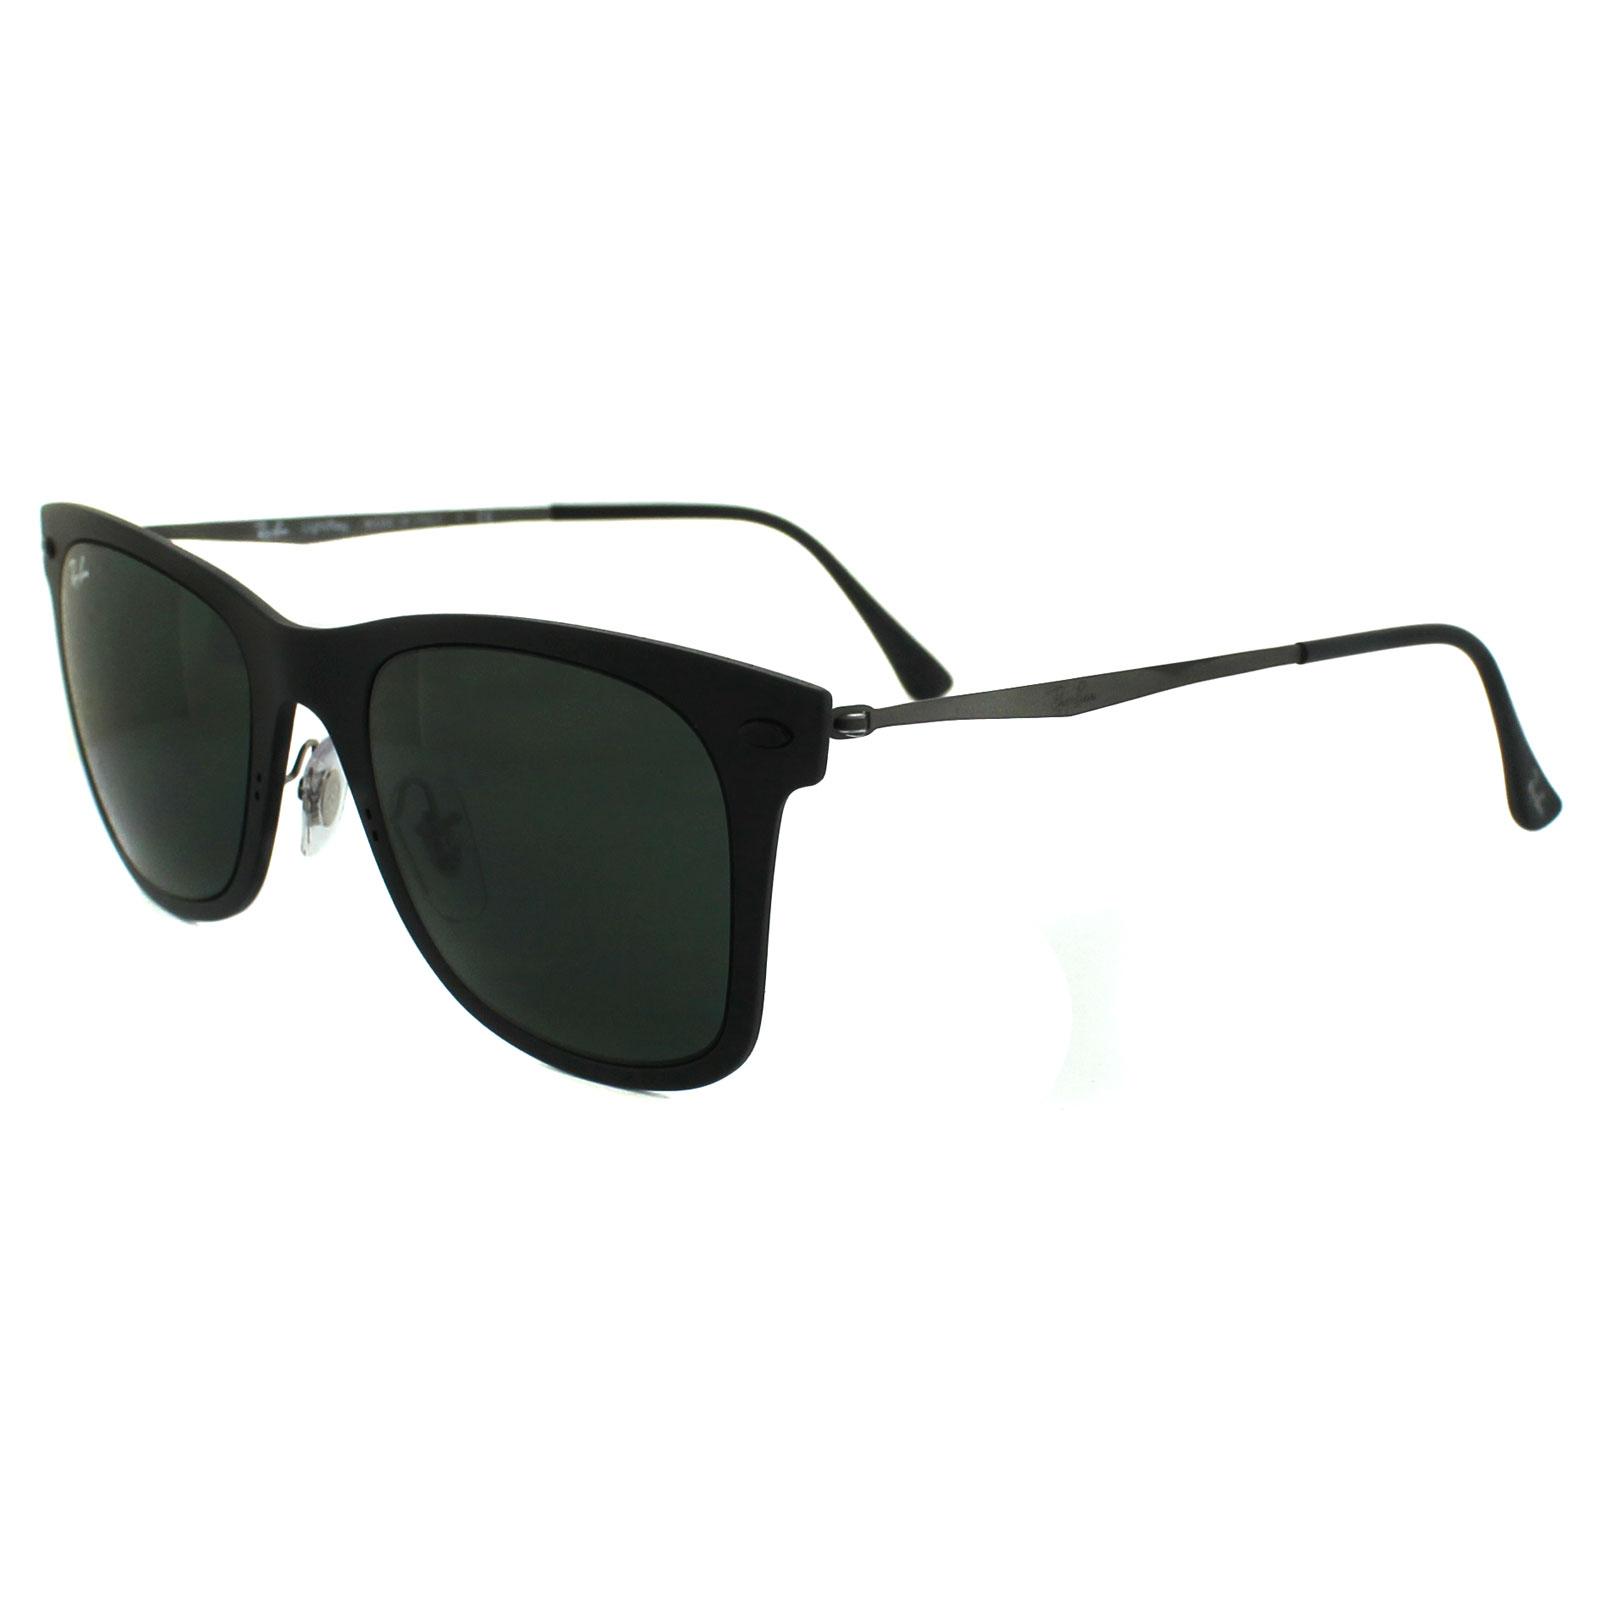 Cheap Ray Ban Wayfarer Light Ray 4210 Sunglasses Discounted Sunglasses